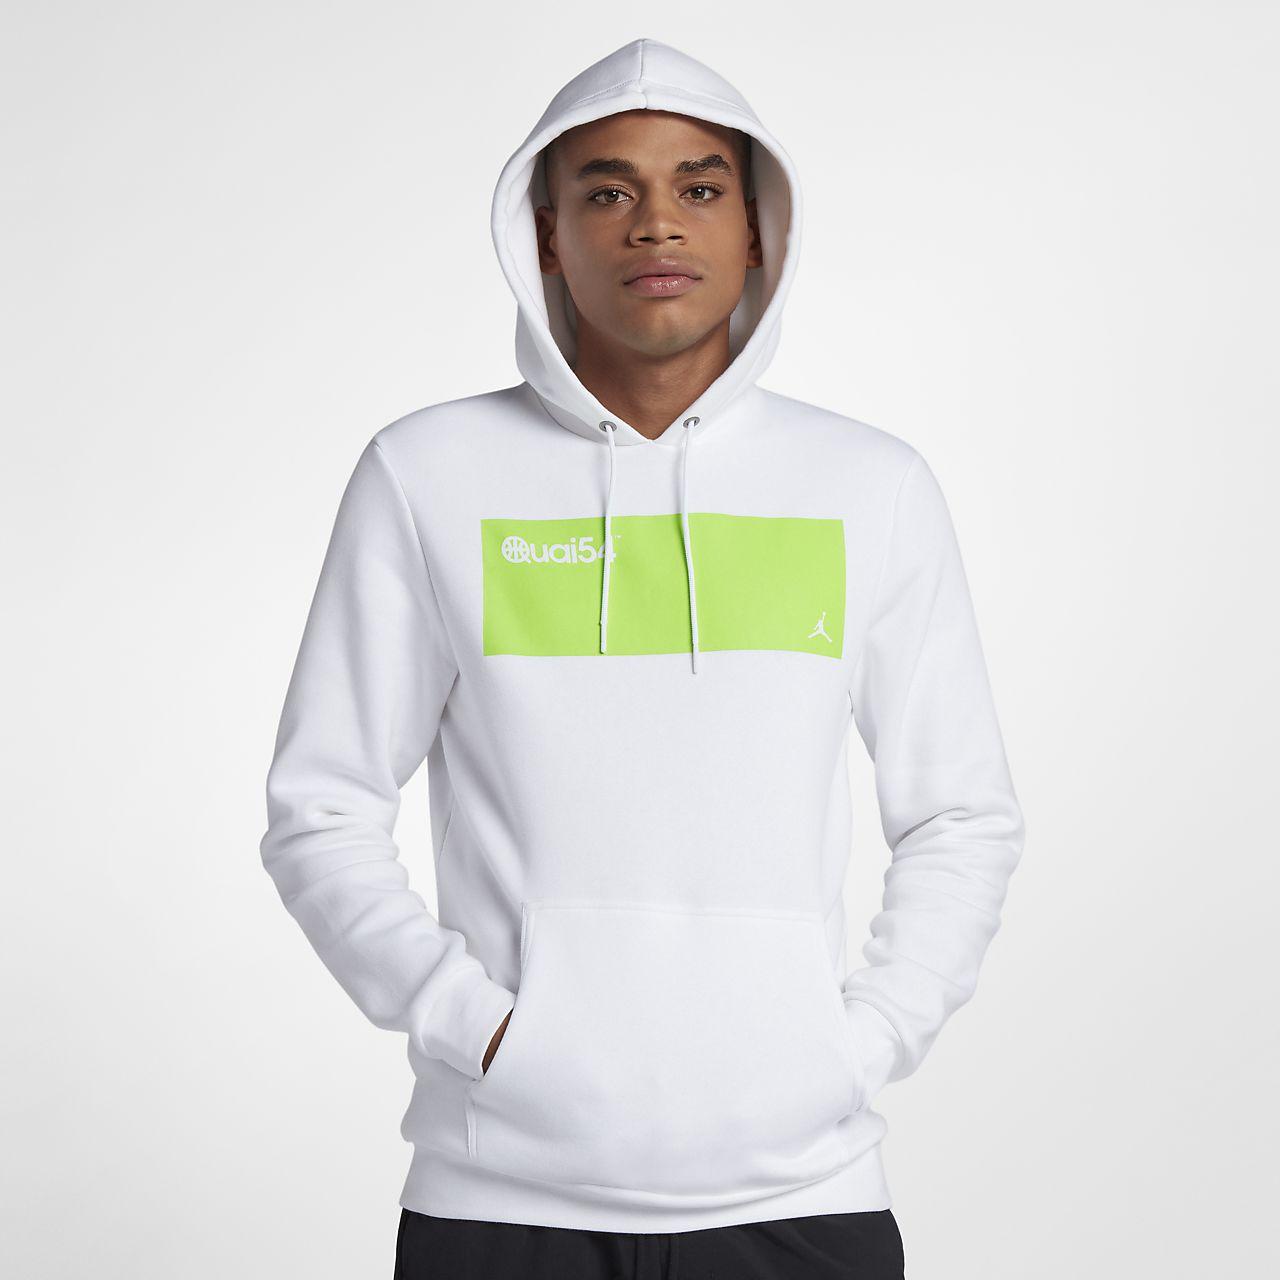 reputable site 5d28b ff099 Jordan Sportswear Quai 54